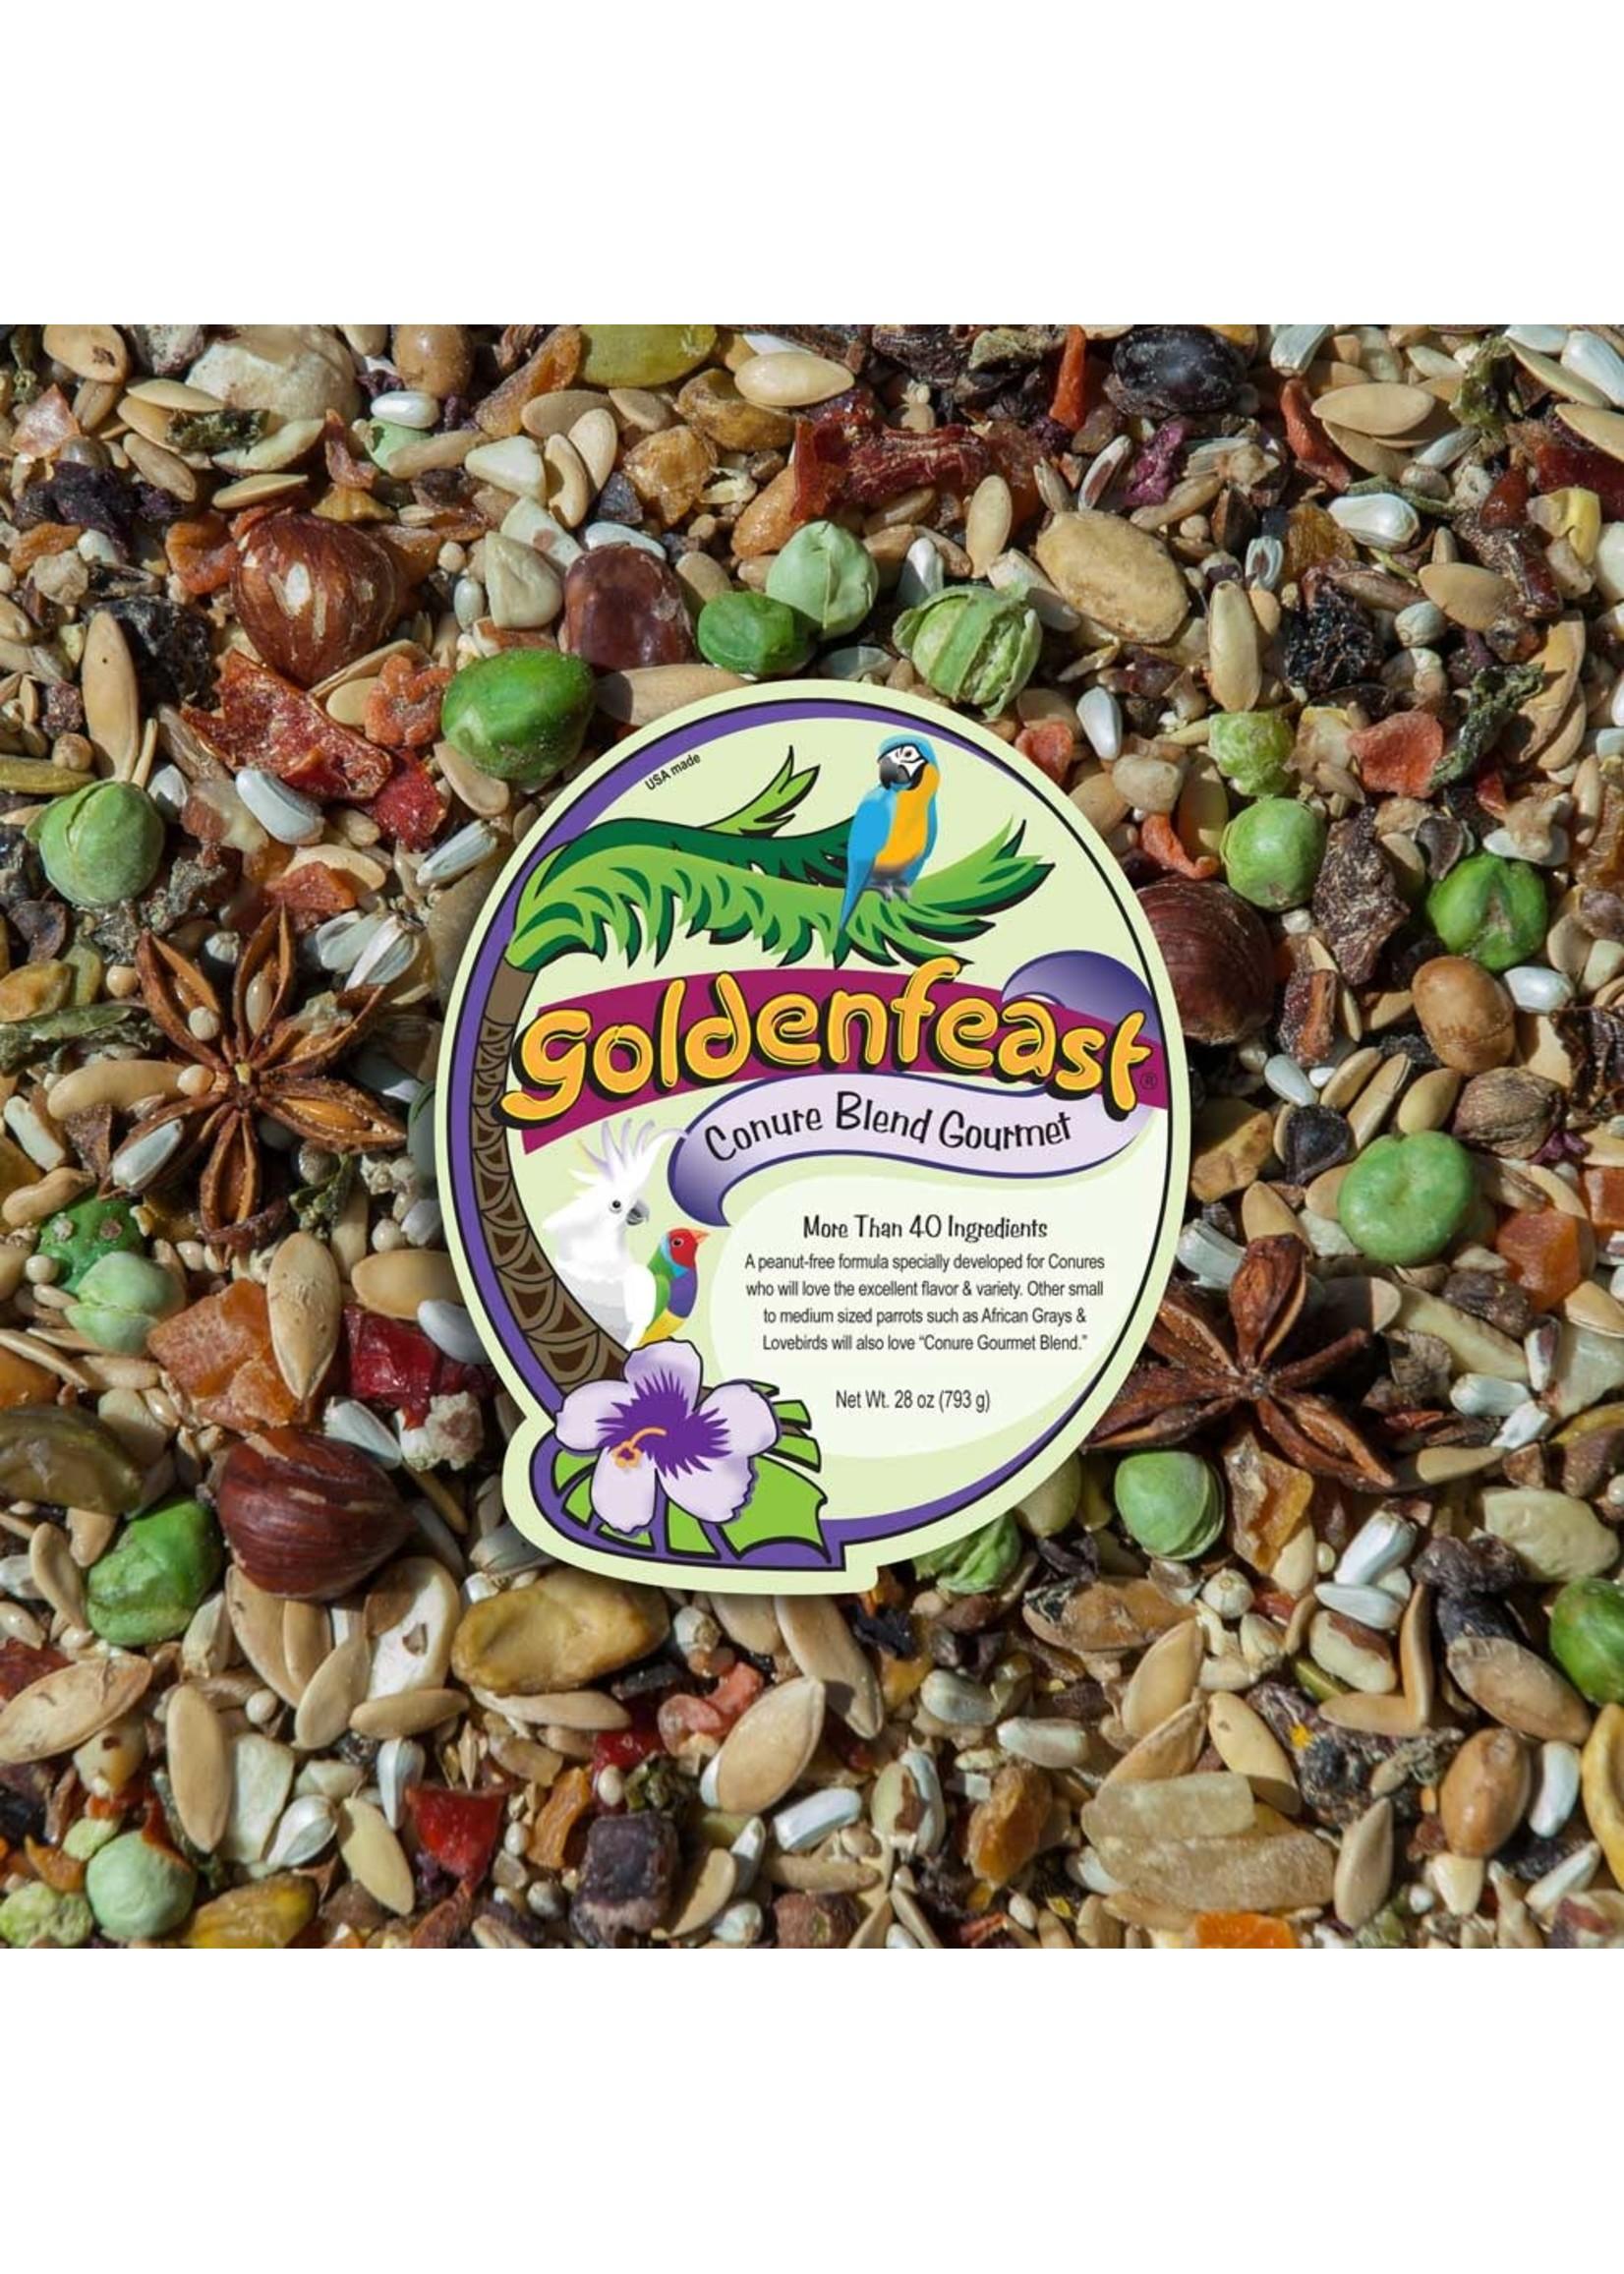 Goldenfeast GF Conure Gourmet Blend (1 LB) 199